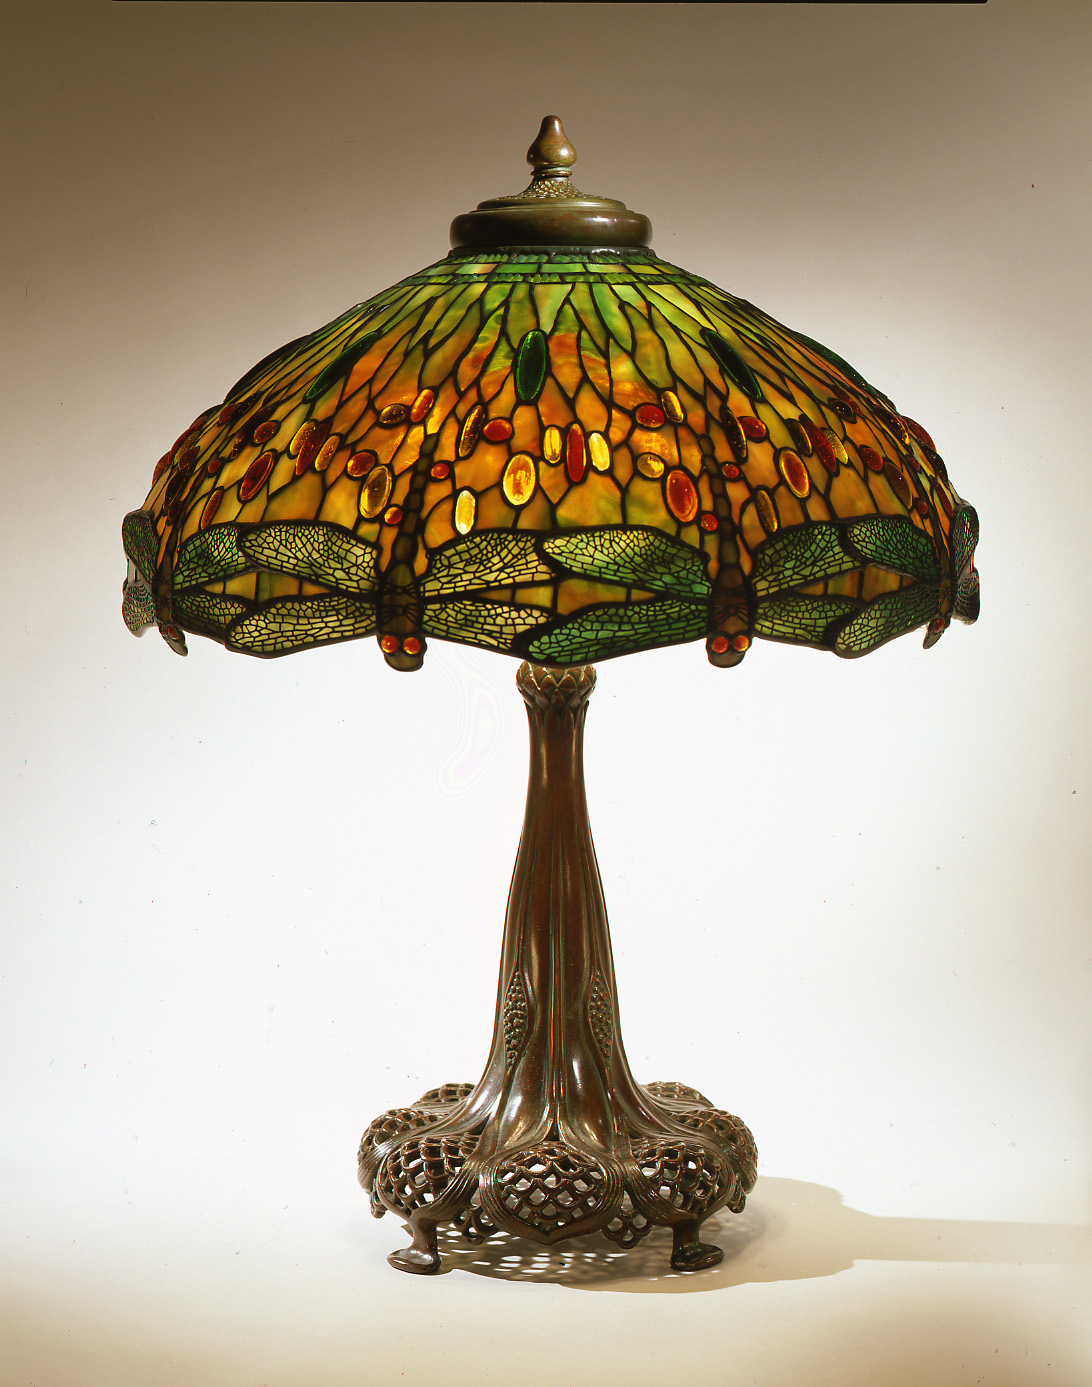 vintage-tiffany-lamps-photo-10